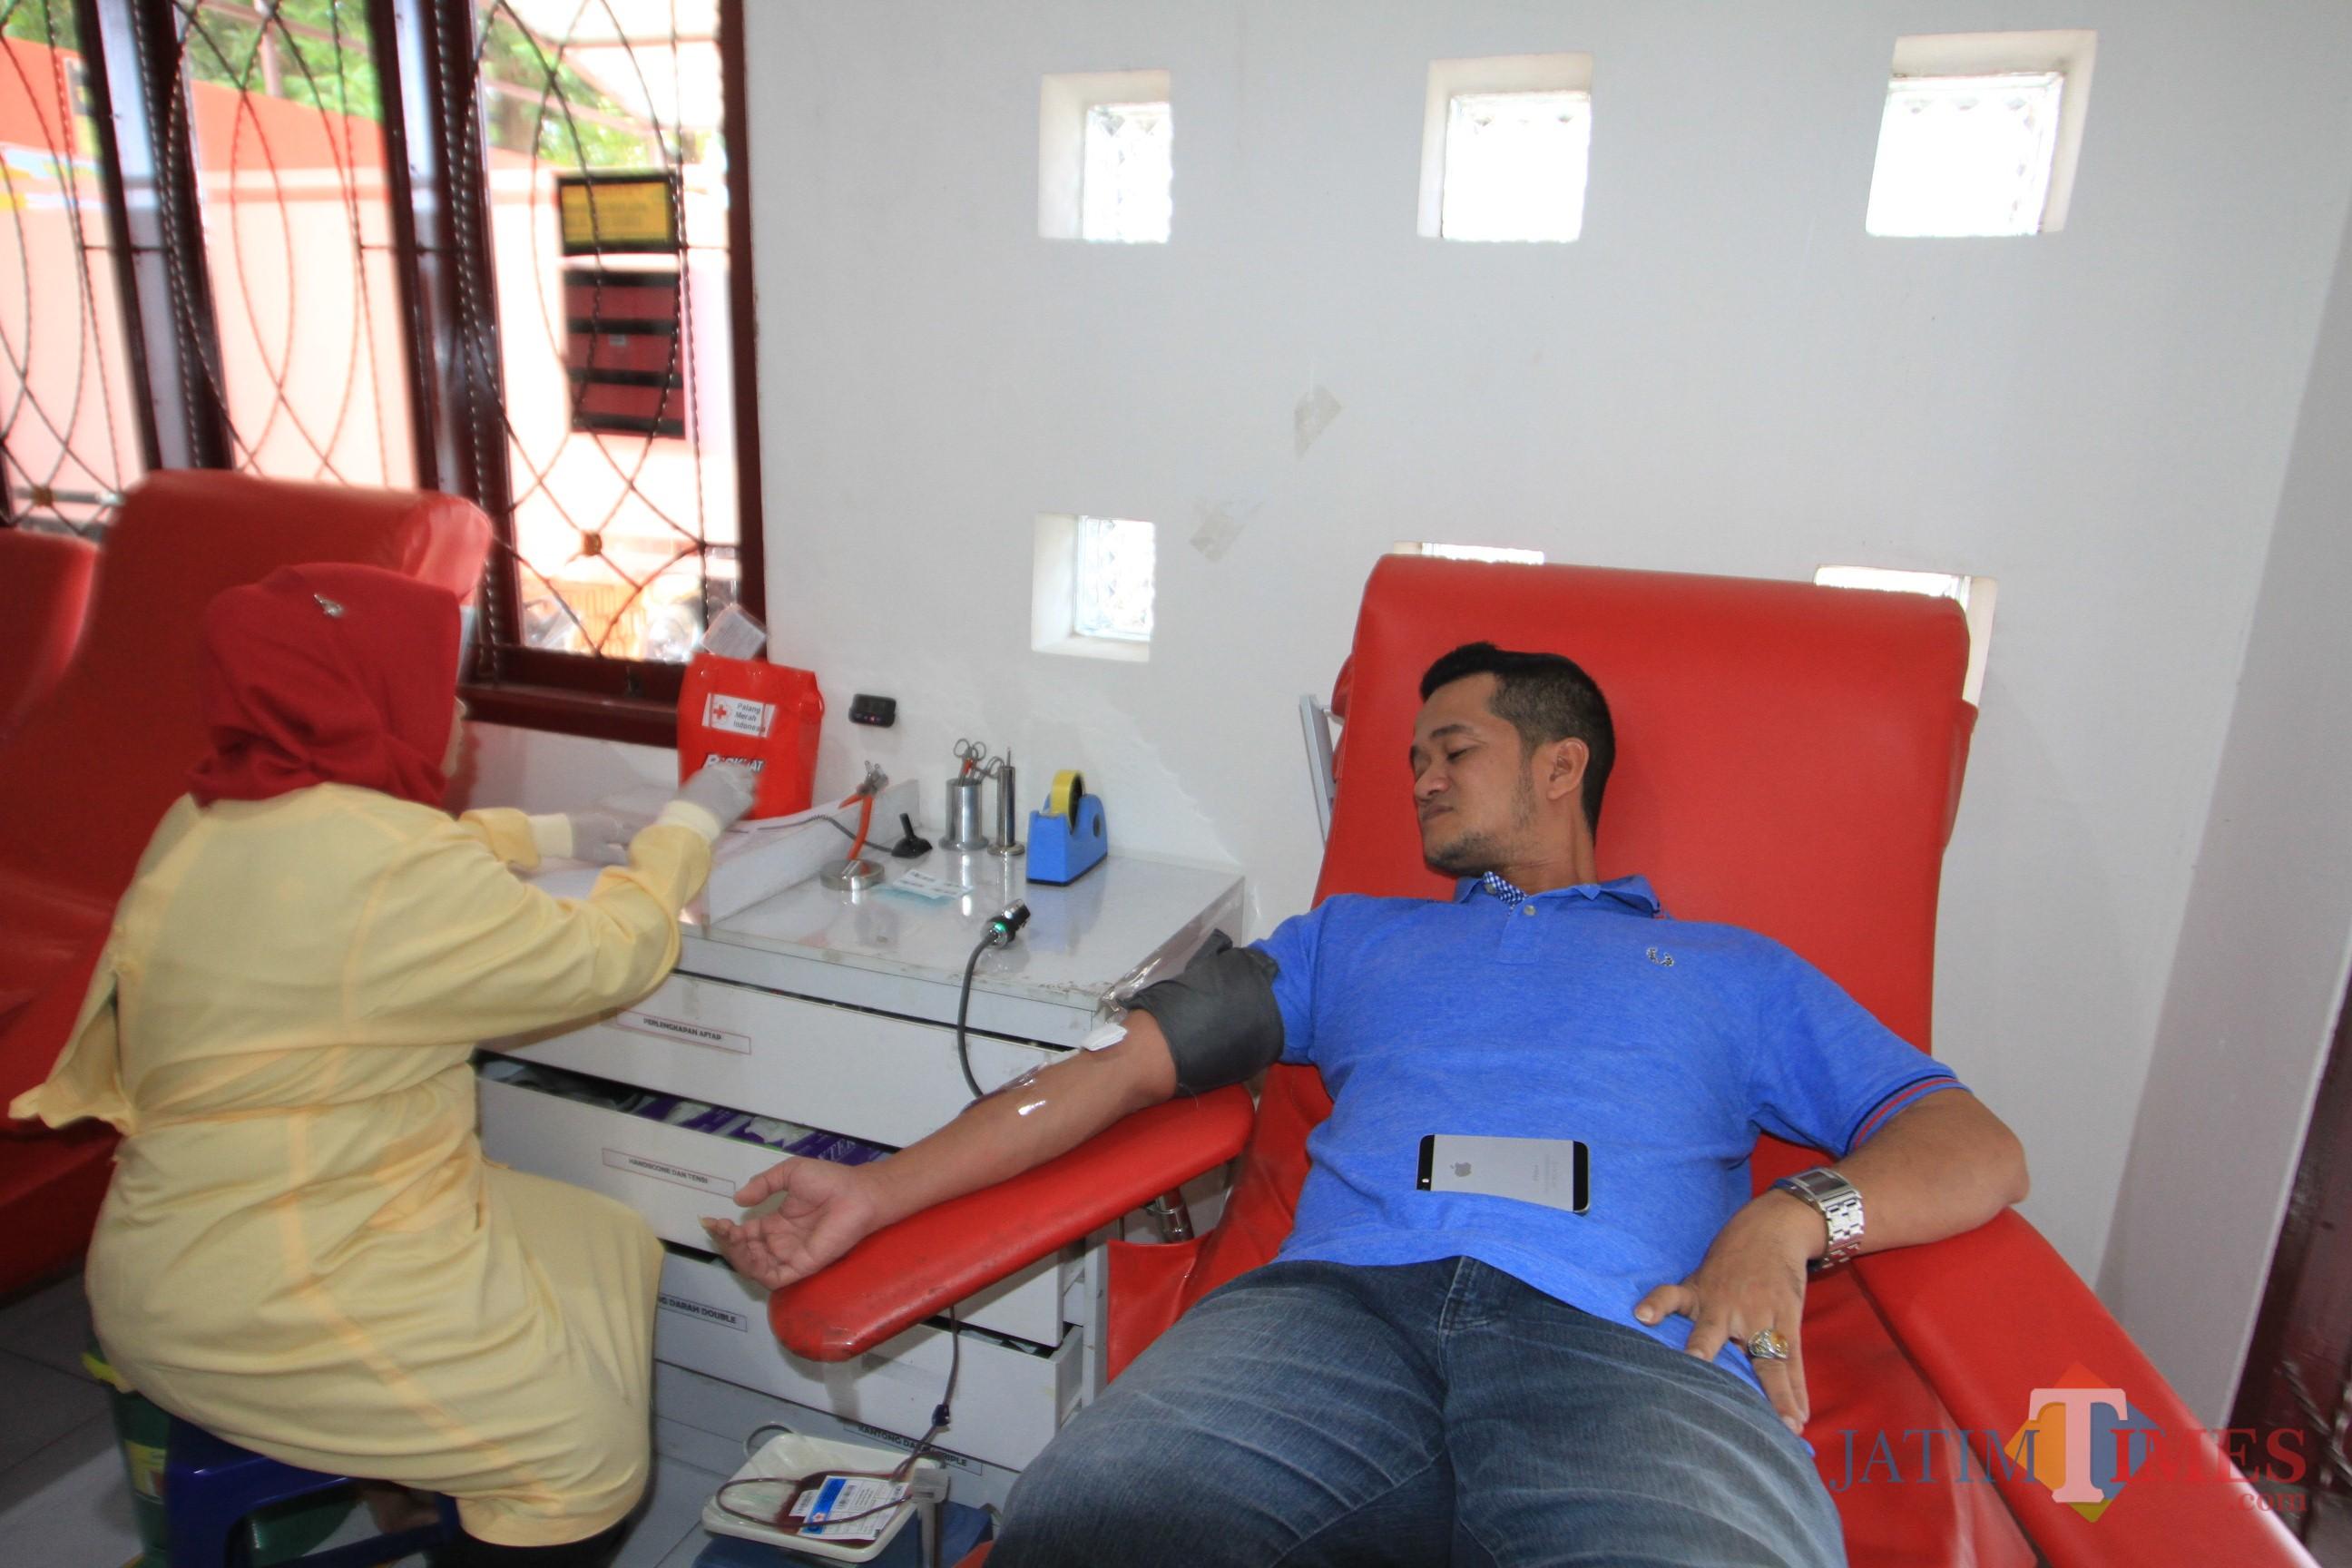 Salah satu warga Kota Probolinggo mendonorkan darahnya ke UTD  Unit Transfusi Darah setempat (Agus Salam/Jatim TIMES)